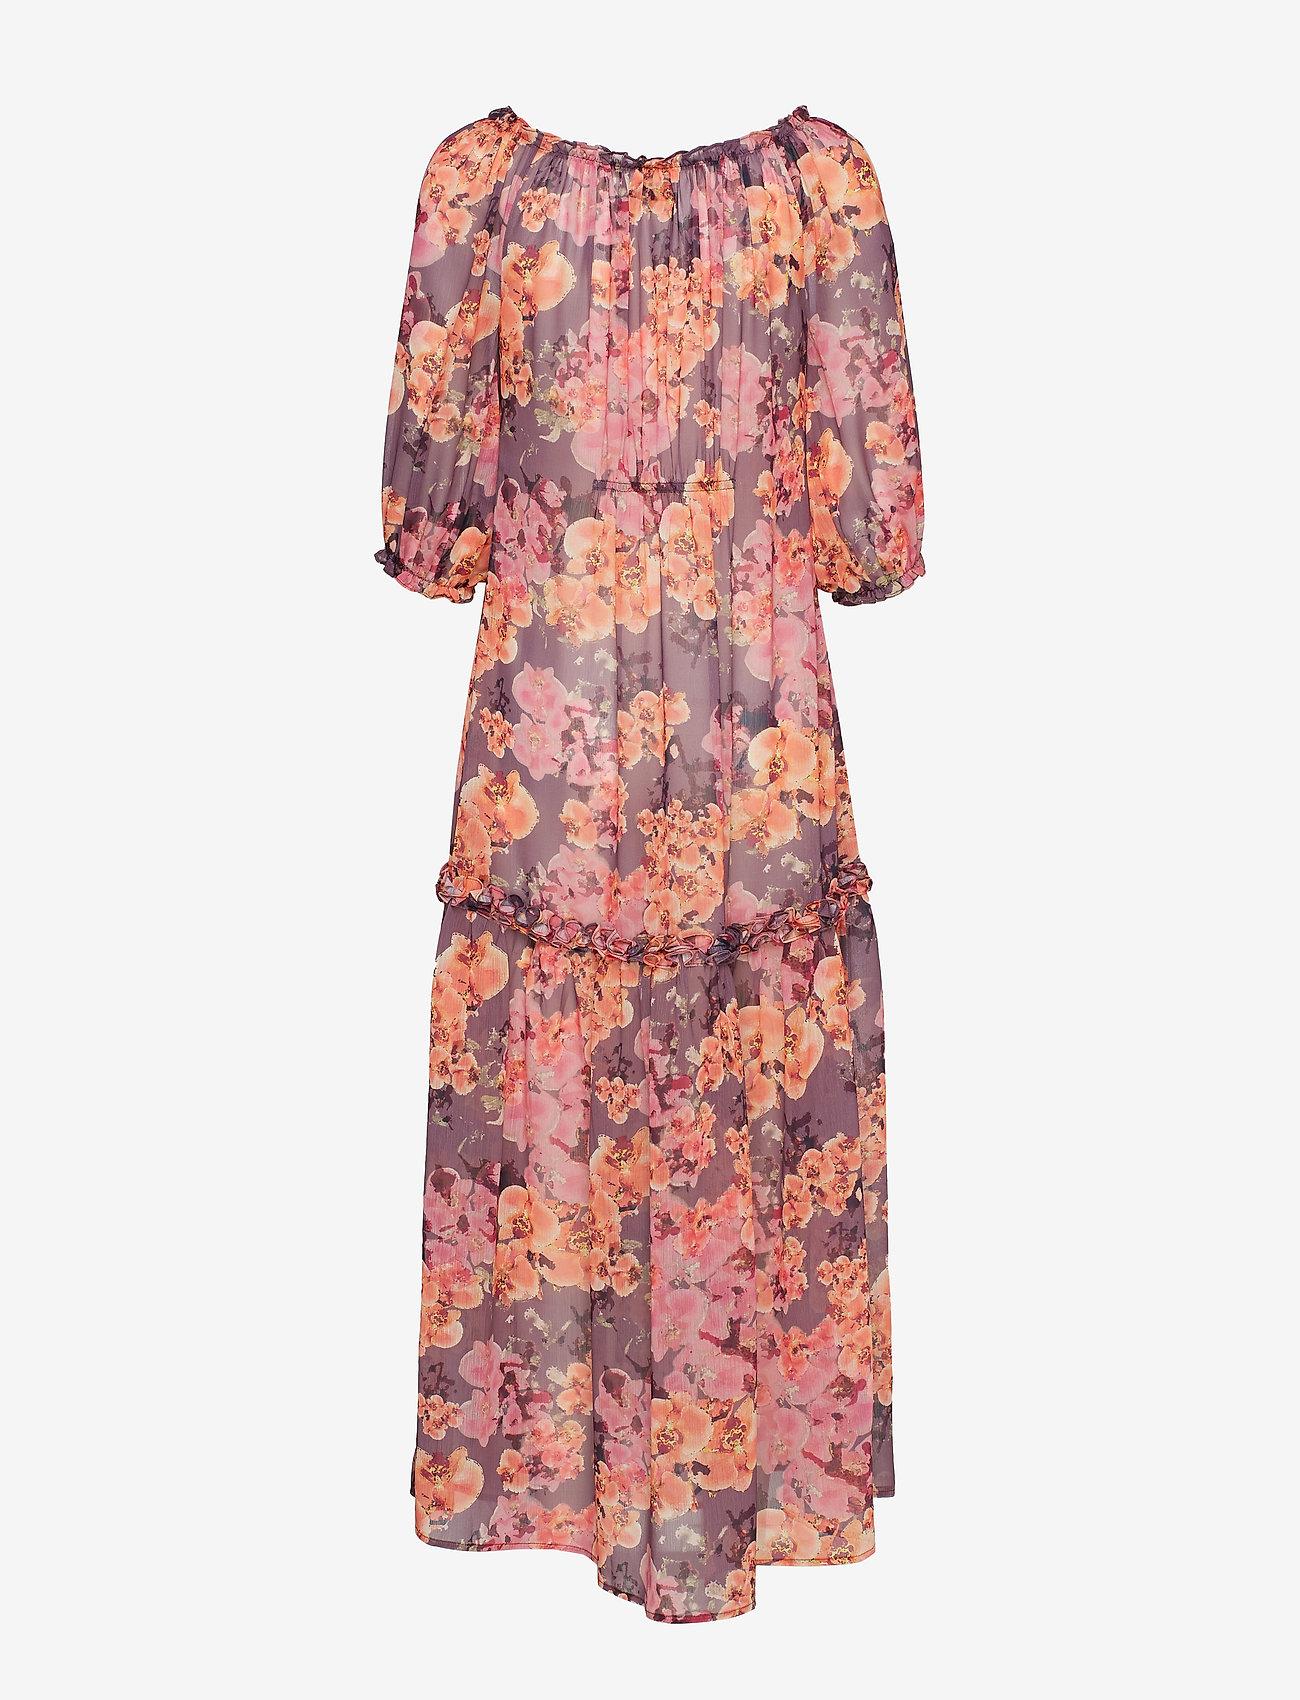 Residusbirgitte Dress - Kleider